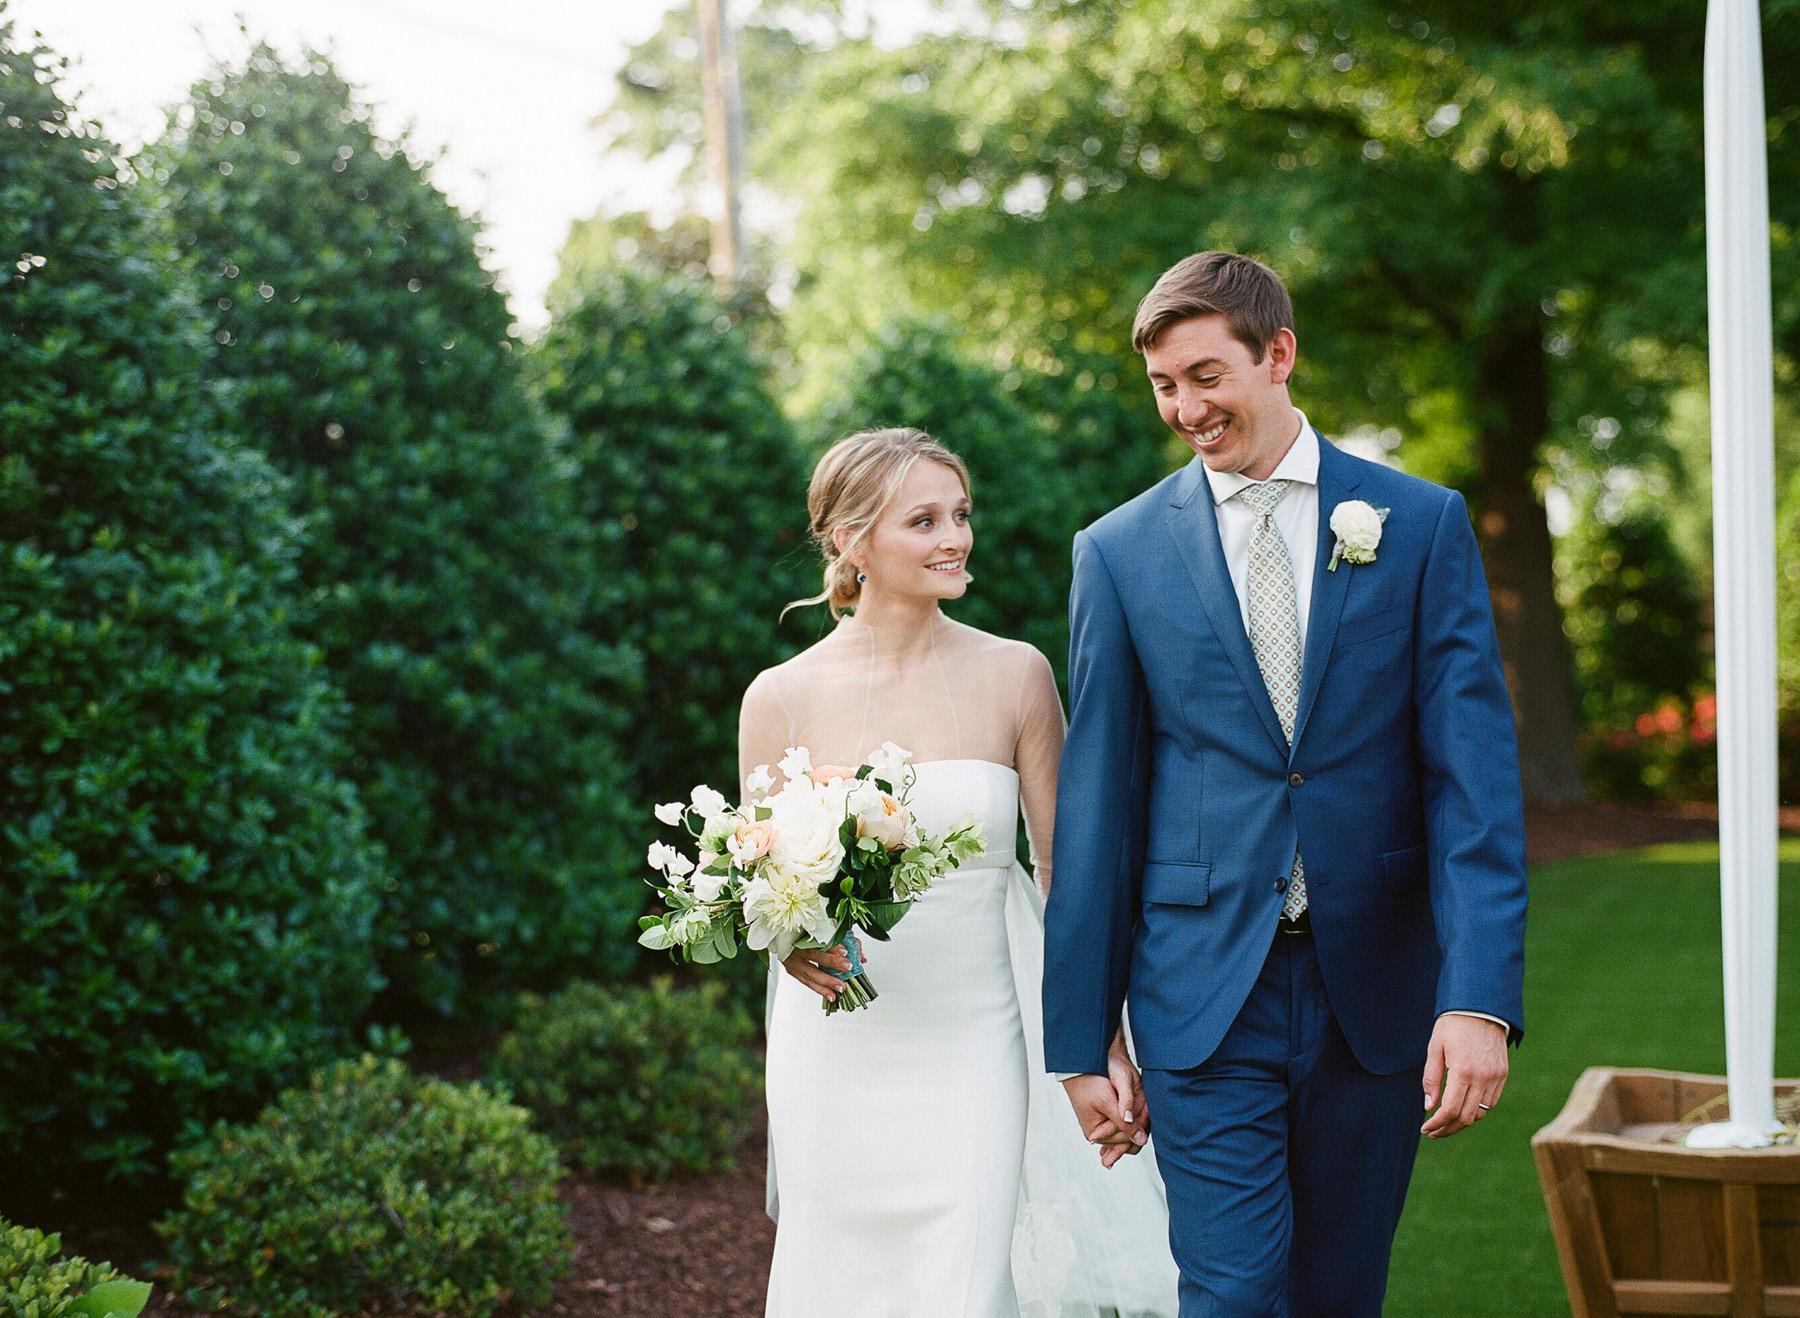 NC-wedding-photographer-best-18.jpg